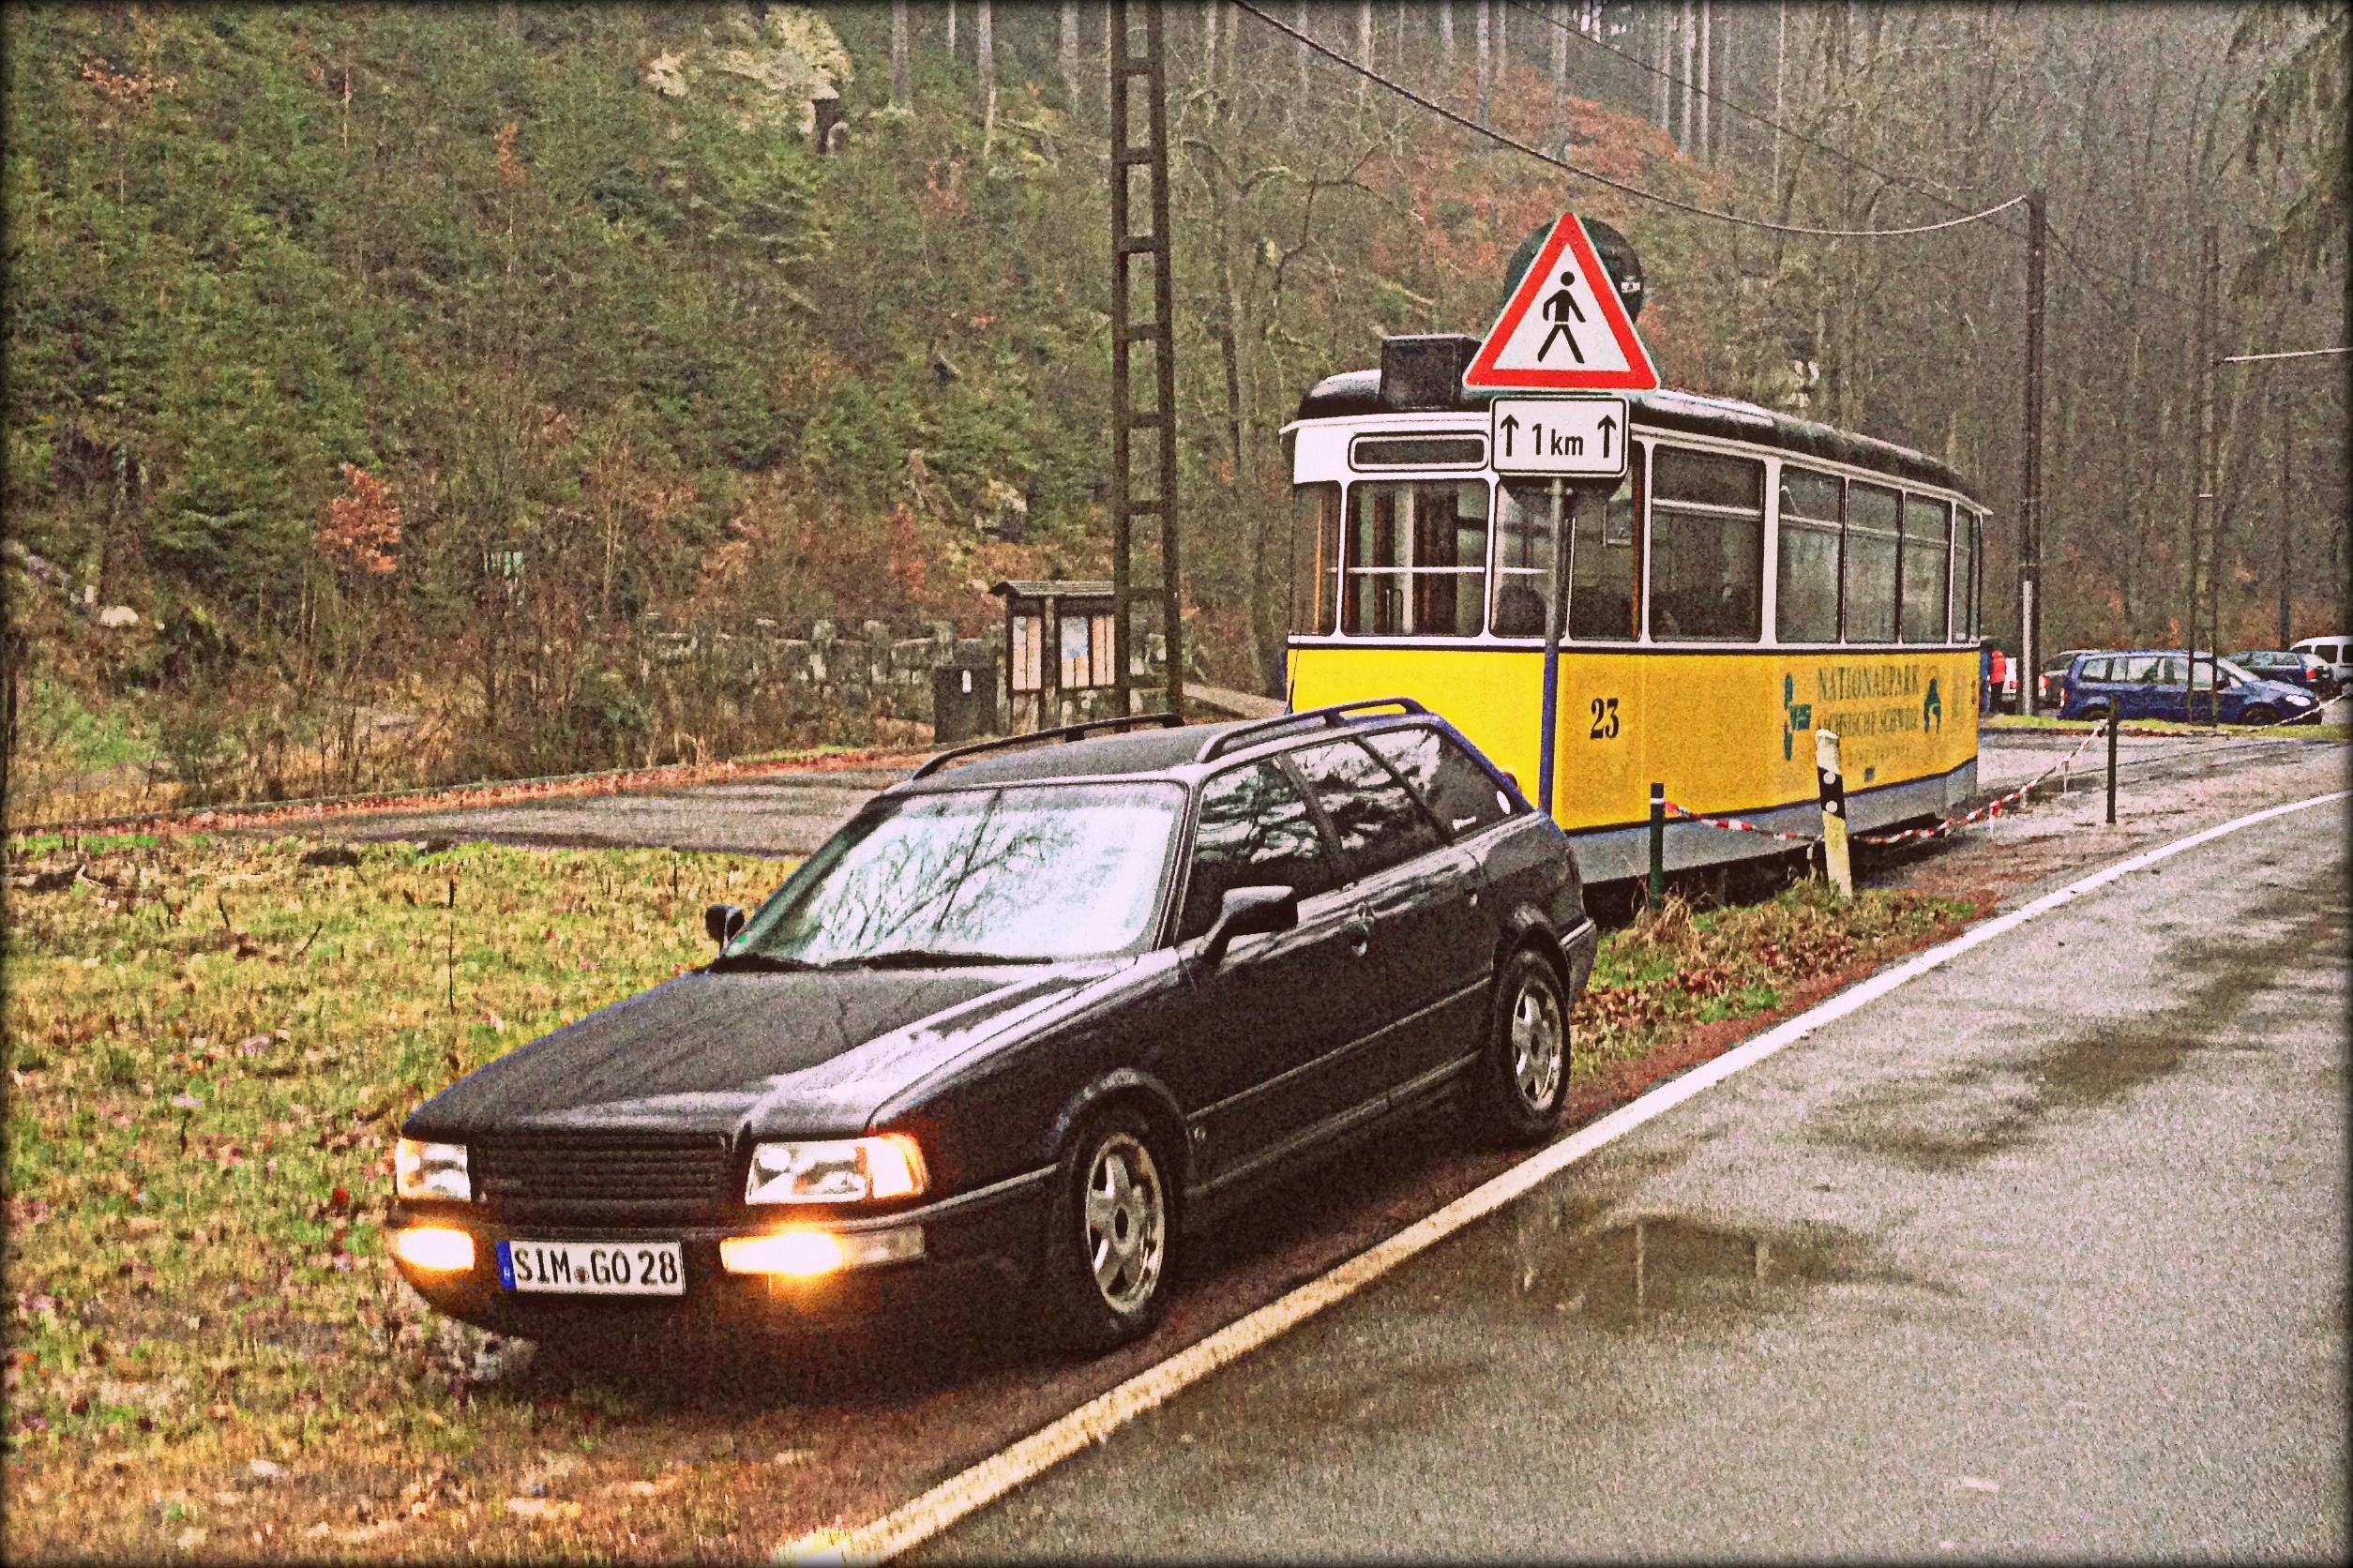 Mit dem Youngtimer durch die Republik – Roadtrip mit dem Audi 80 Avant quattro